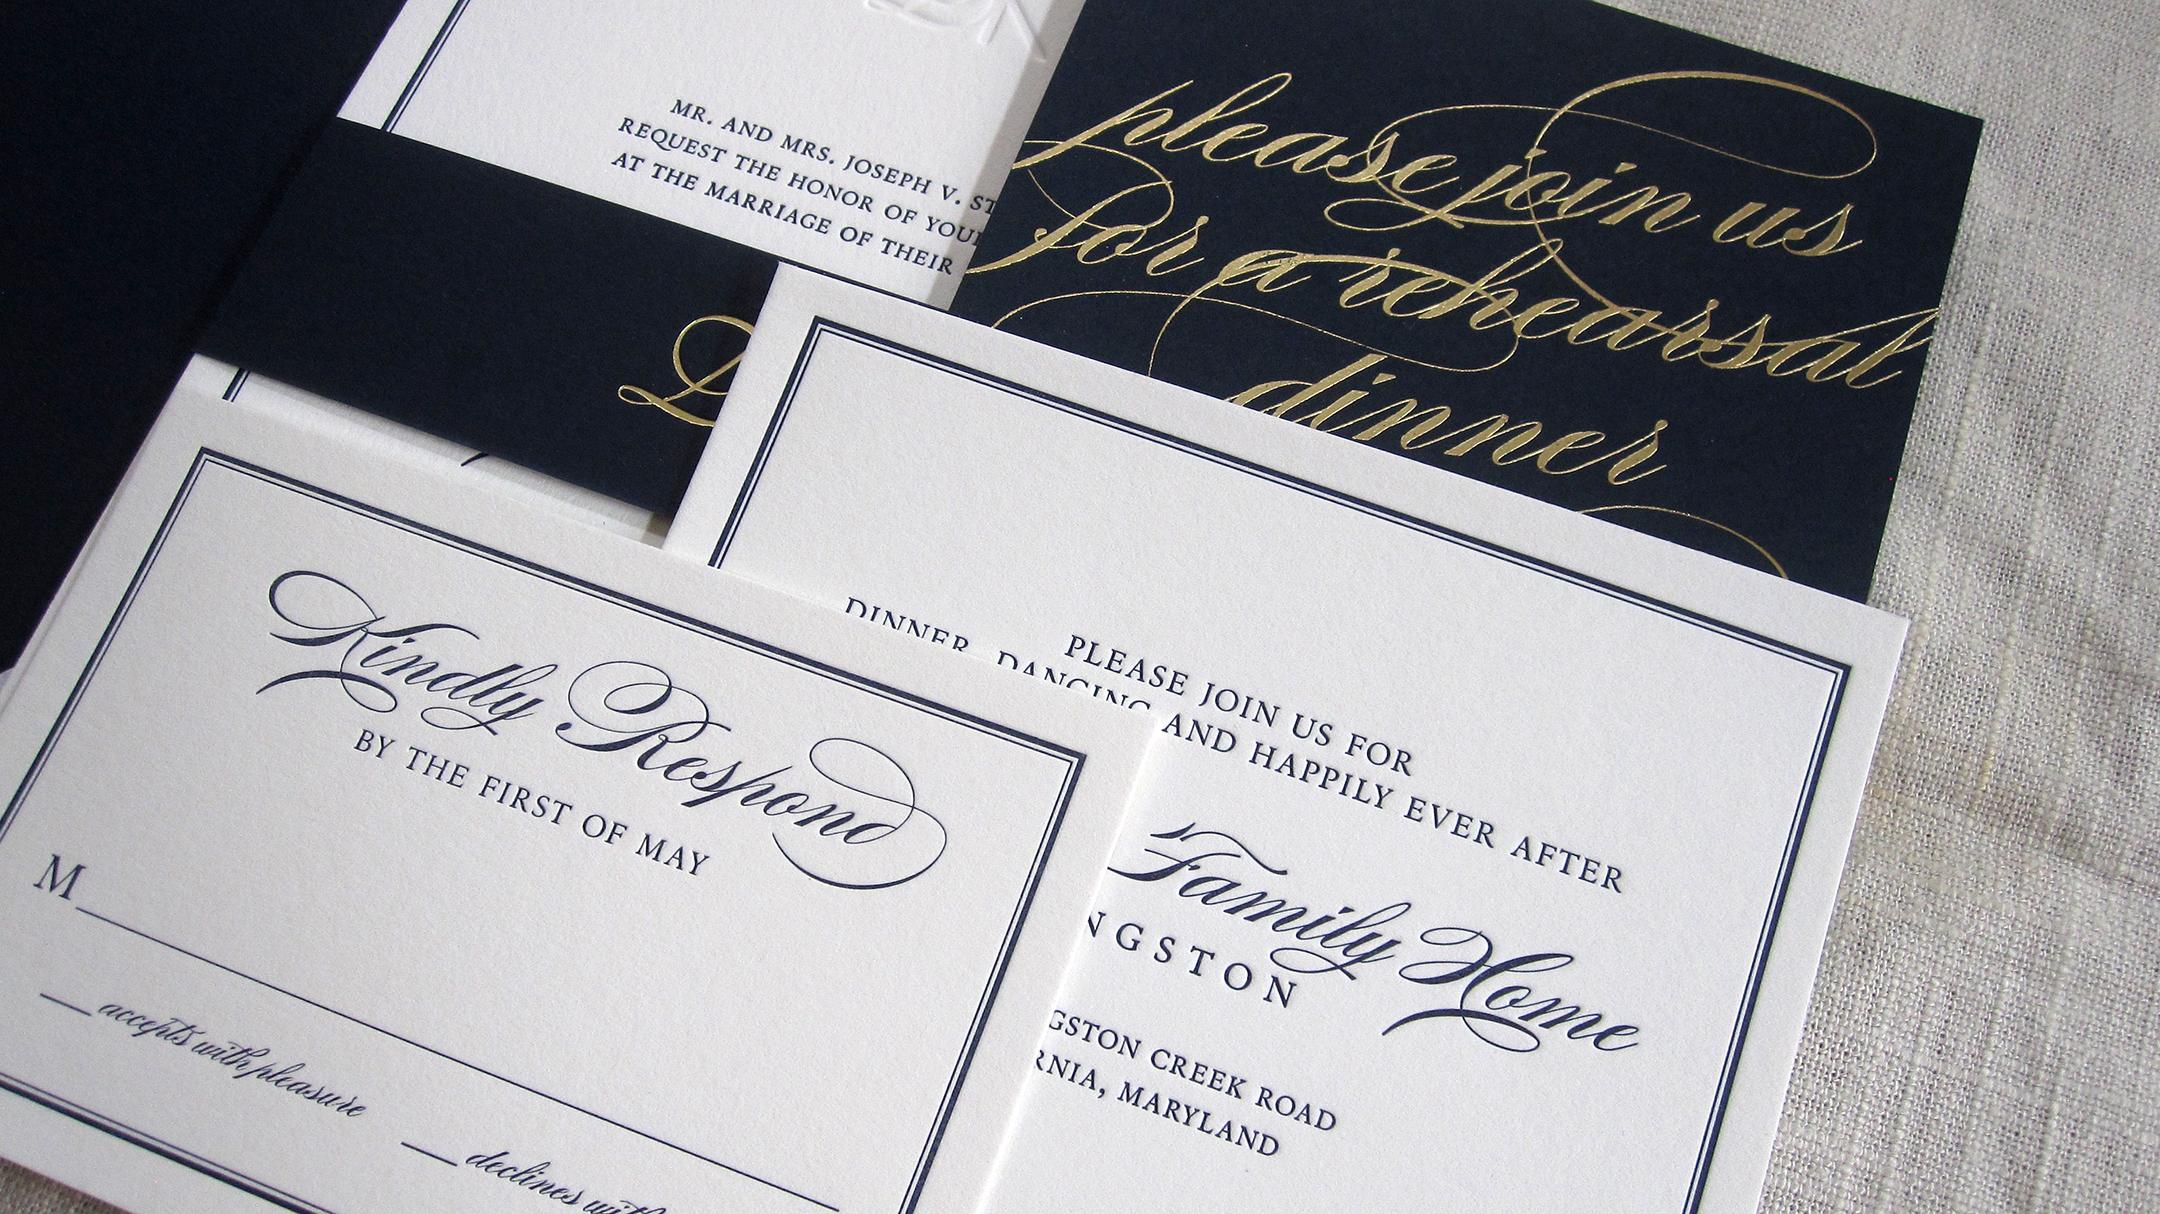 EasternShore_wedding_invitations.jpg